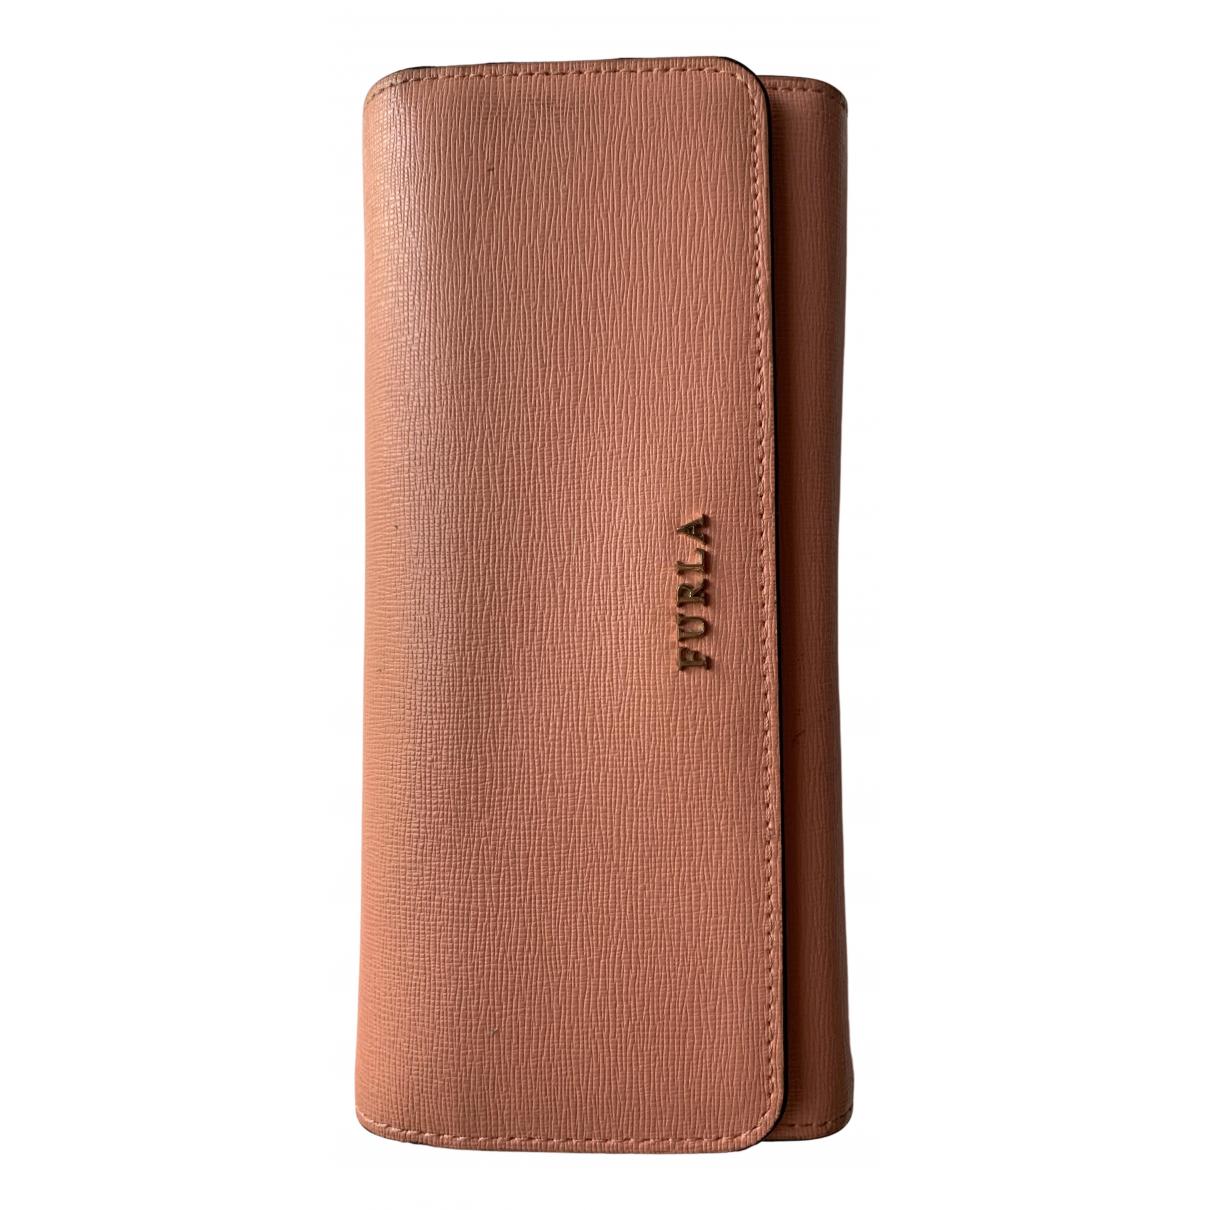 Furla N Orange Patent leather wallet for Women N